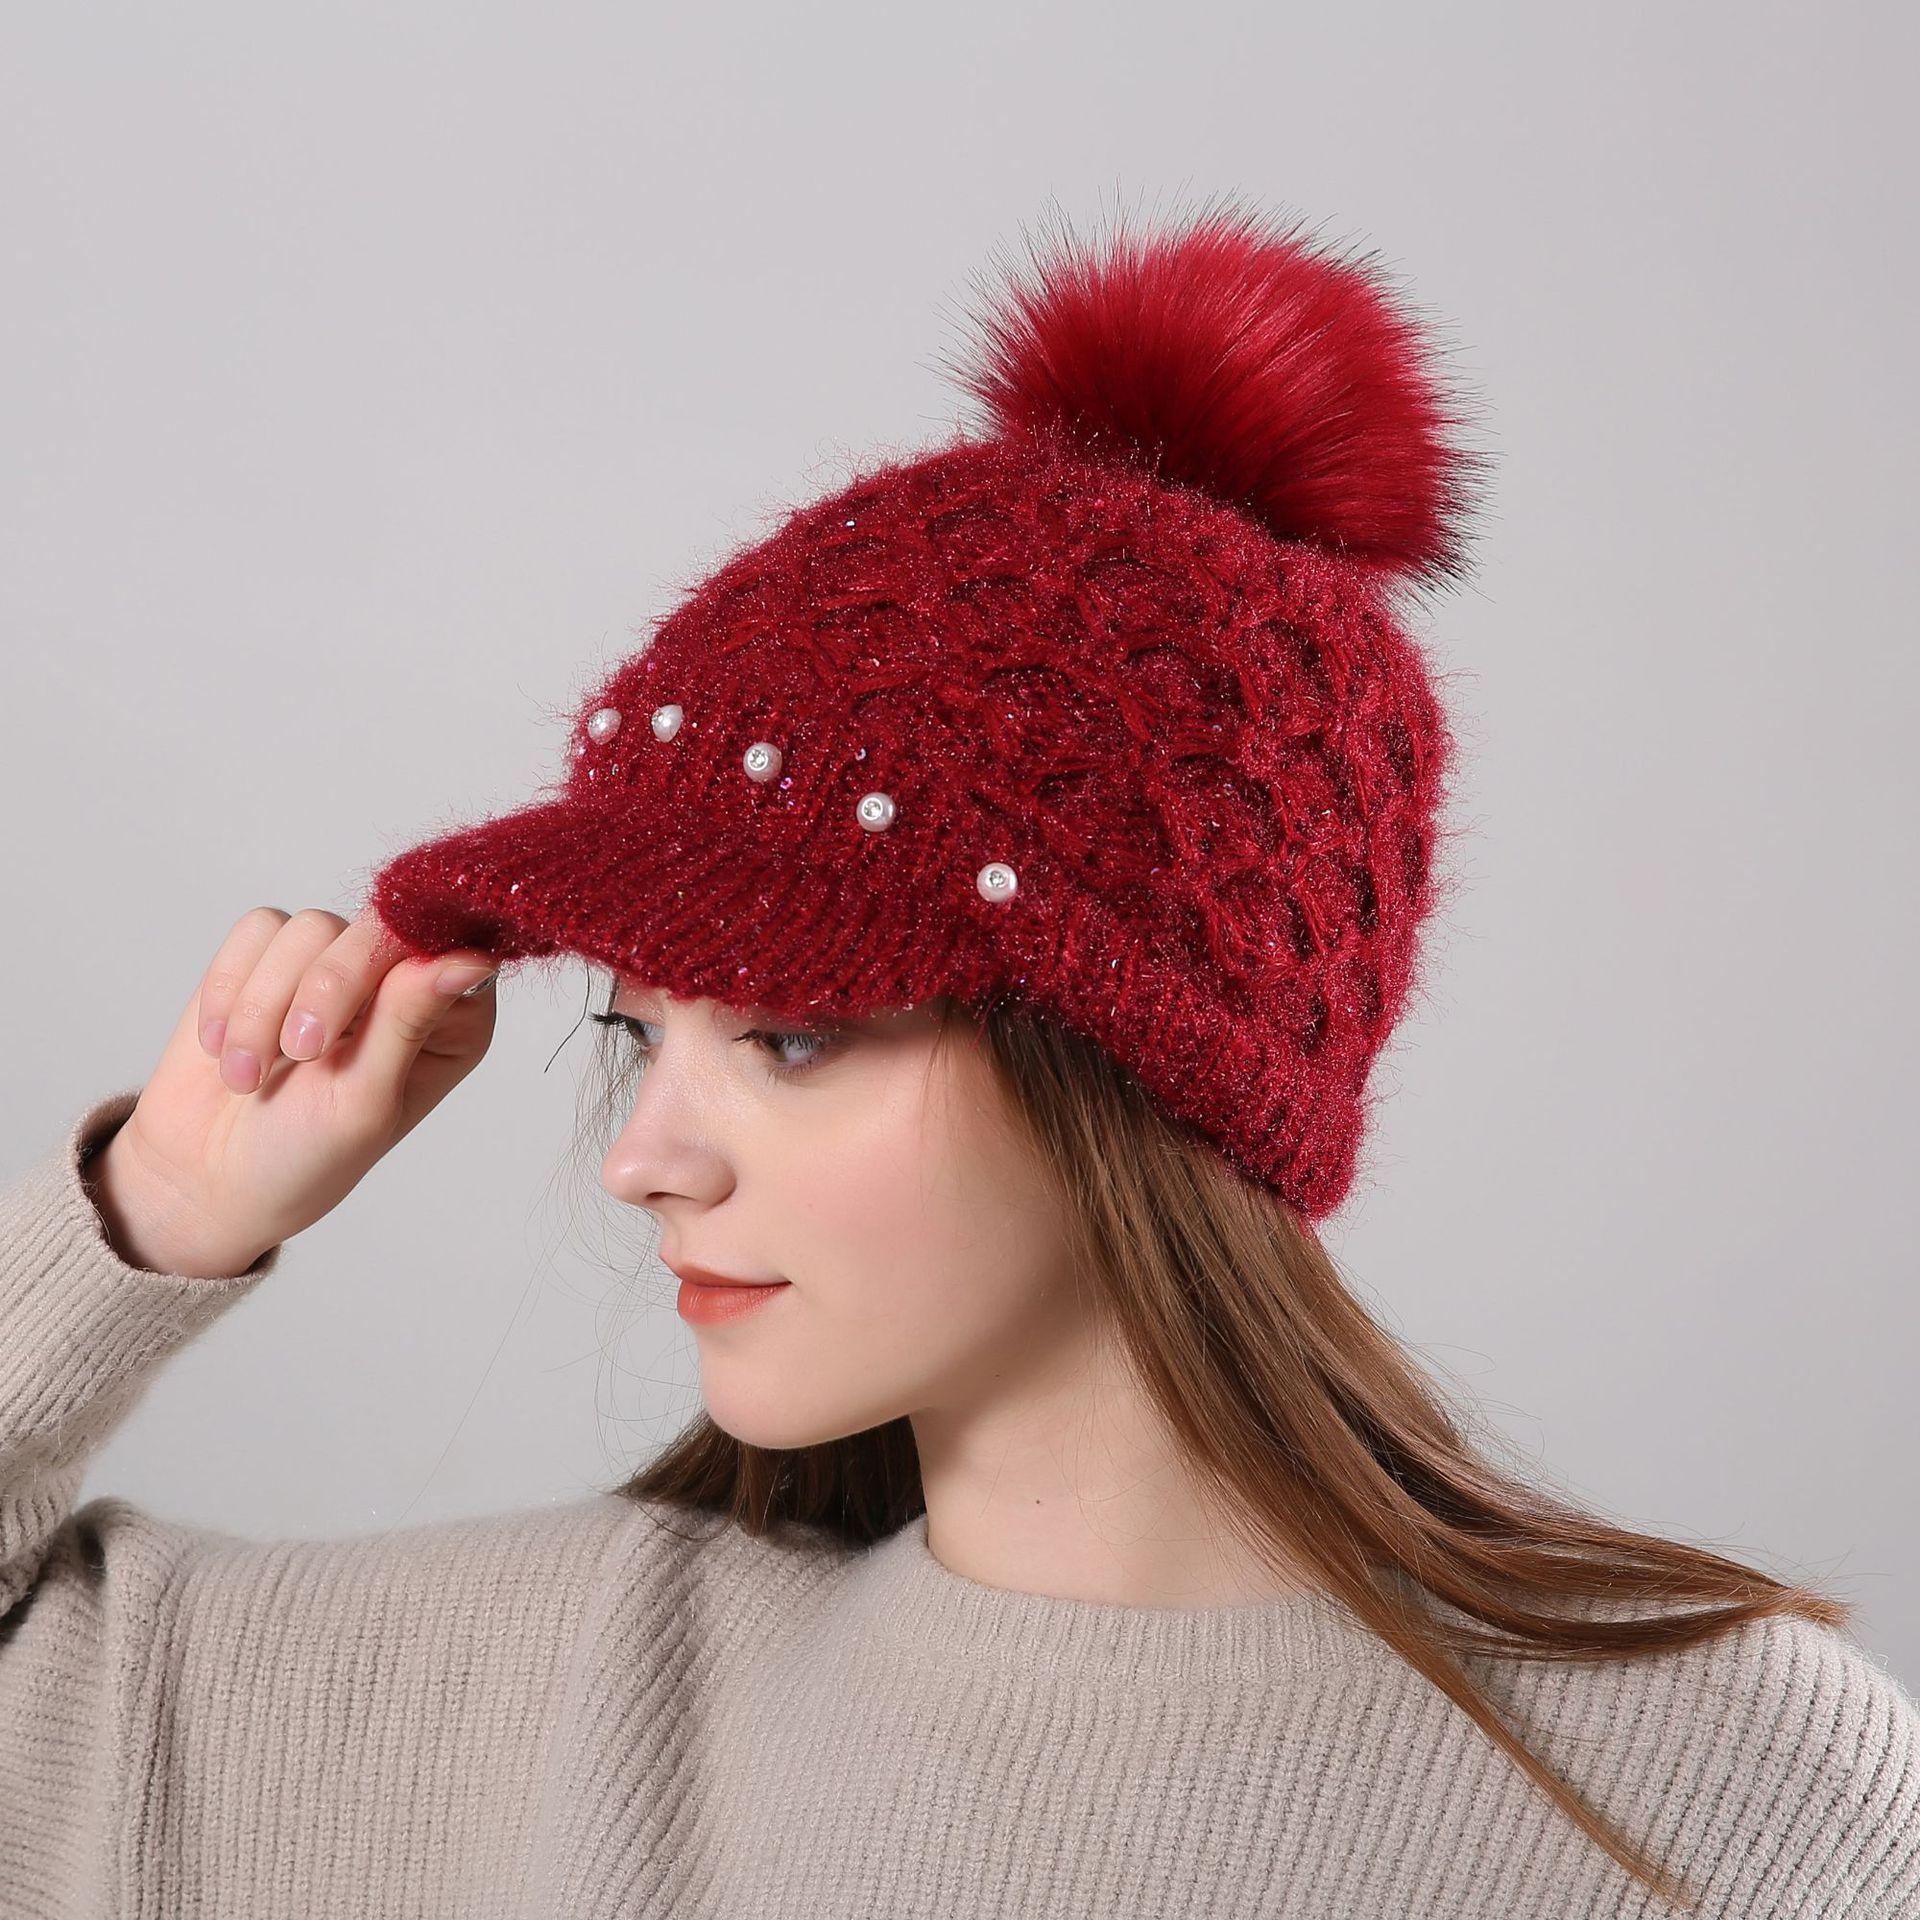 Señoras de terciopelo cálido lana Cap niñas perla diamante pelo de conejo Gorro con pompón moda tejida Cap cómodo Casual sombrero con viseras B-8449